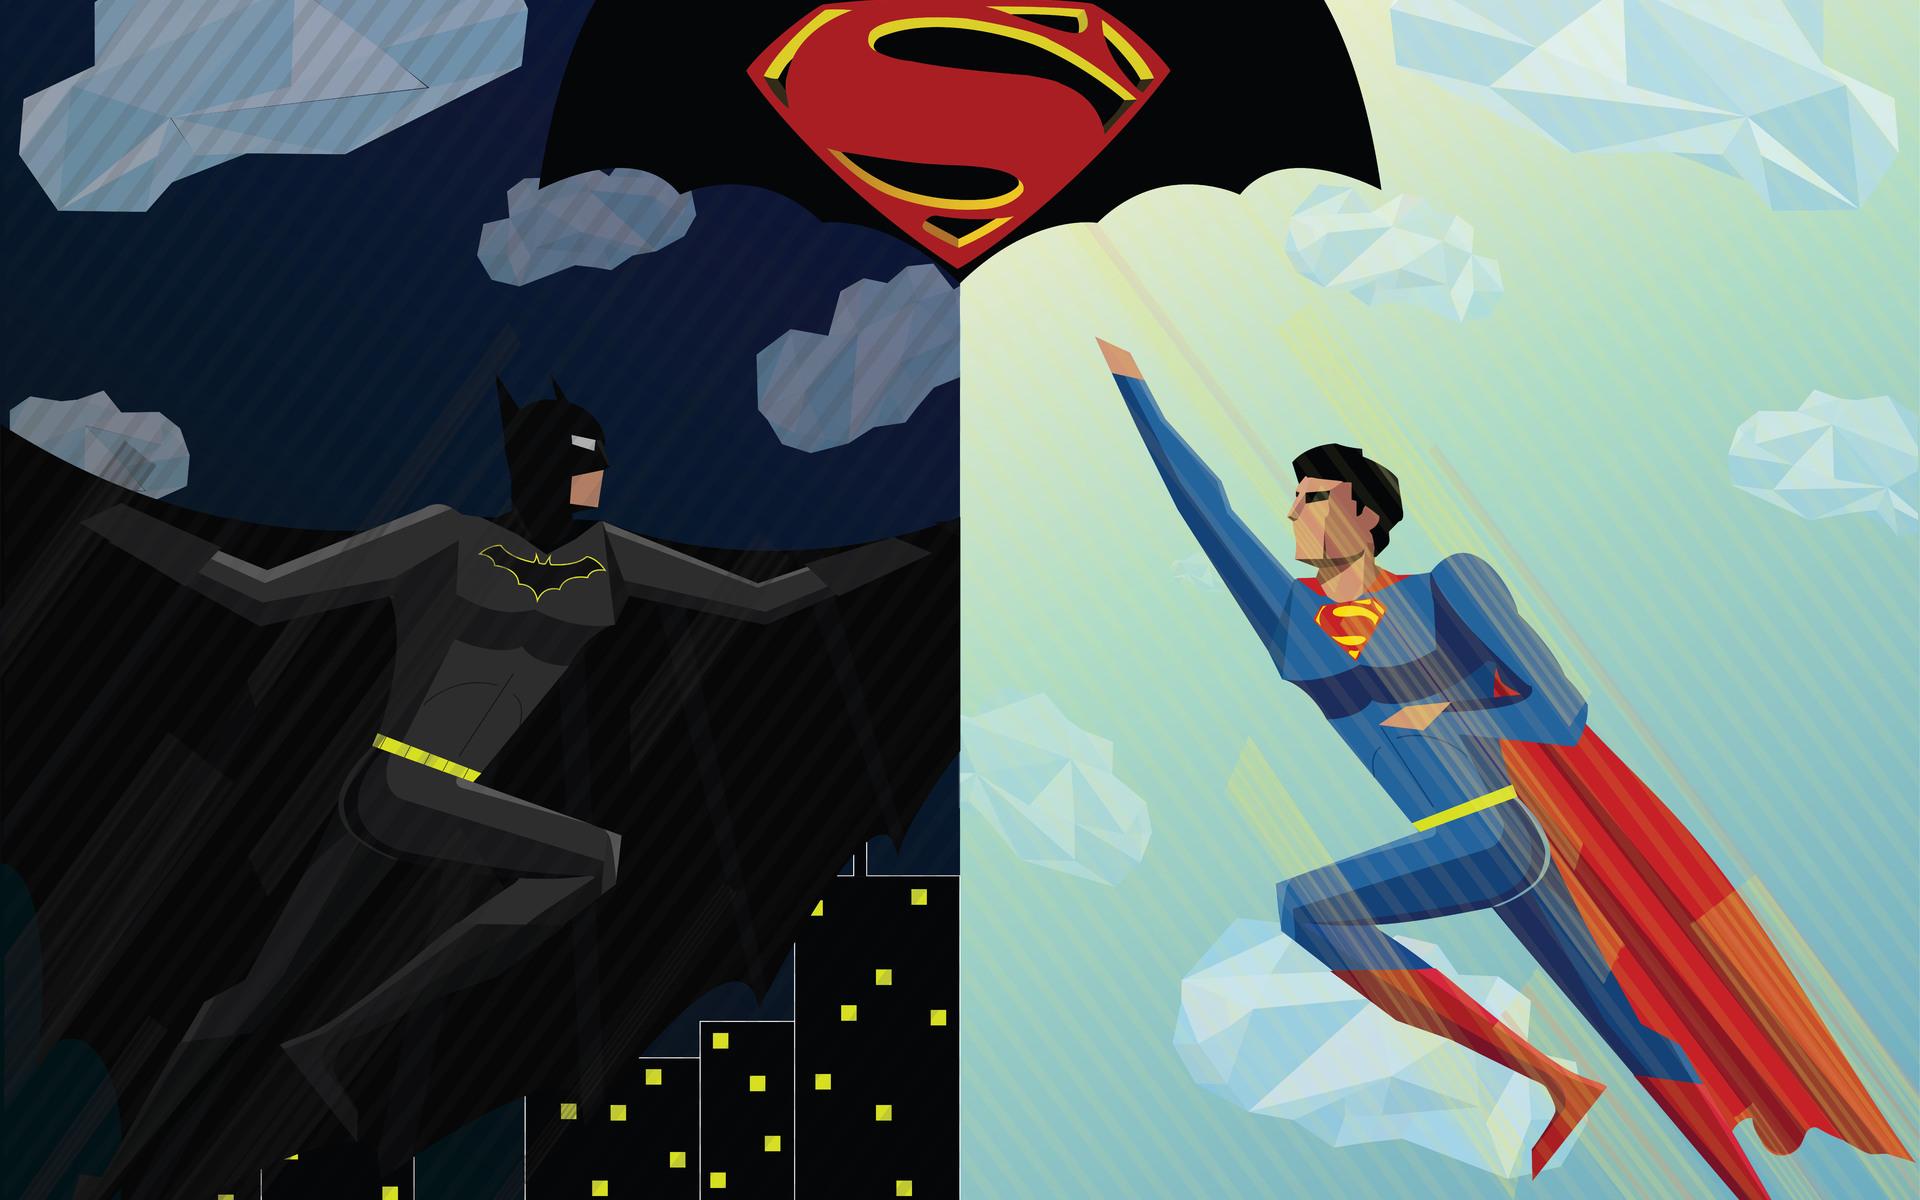 batman-vs-superman-12k-4u.jpg